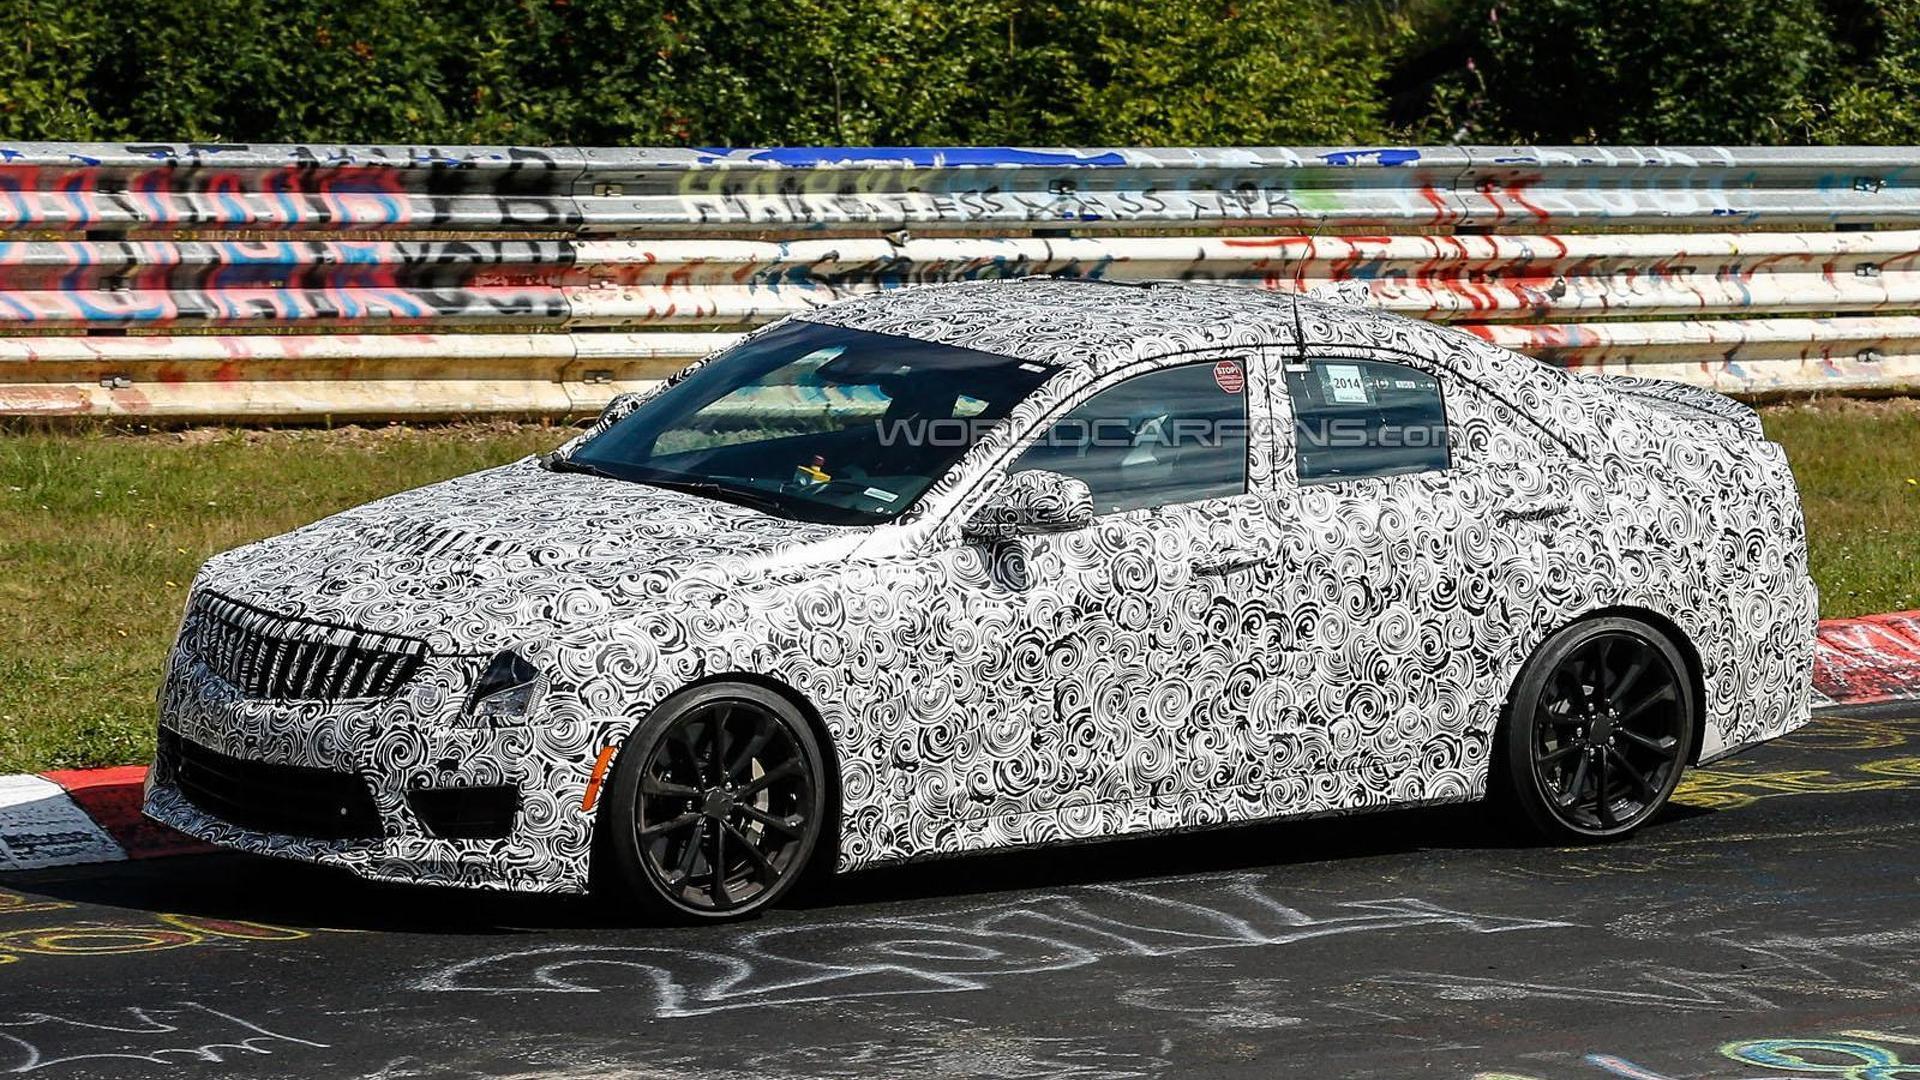 Cadillac confirms 2016 ATS-V Sedan will bow at Los Angeles Auto Show in November